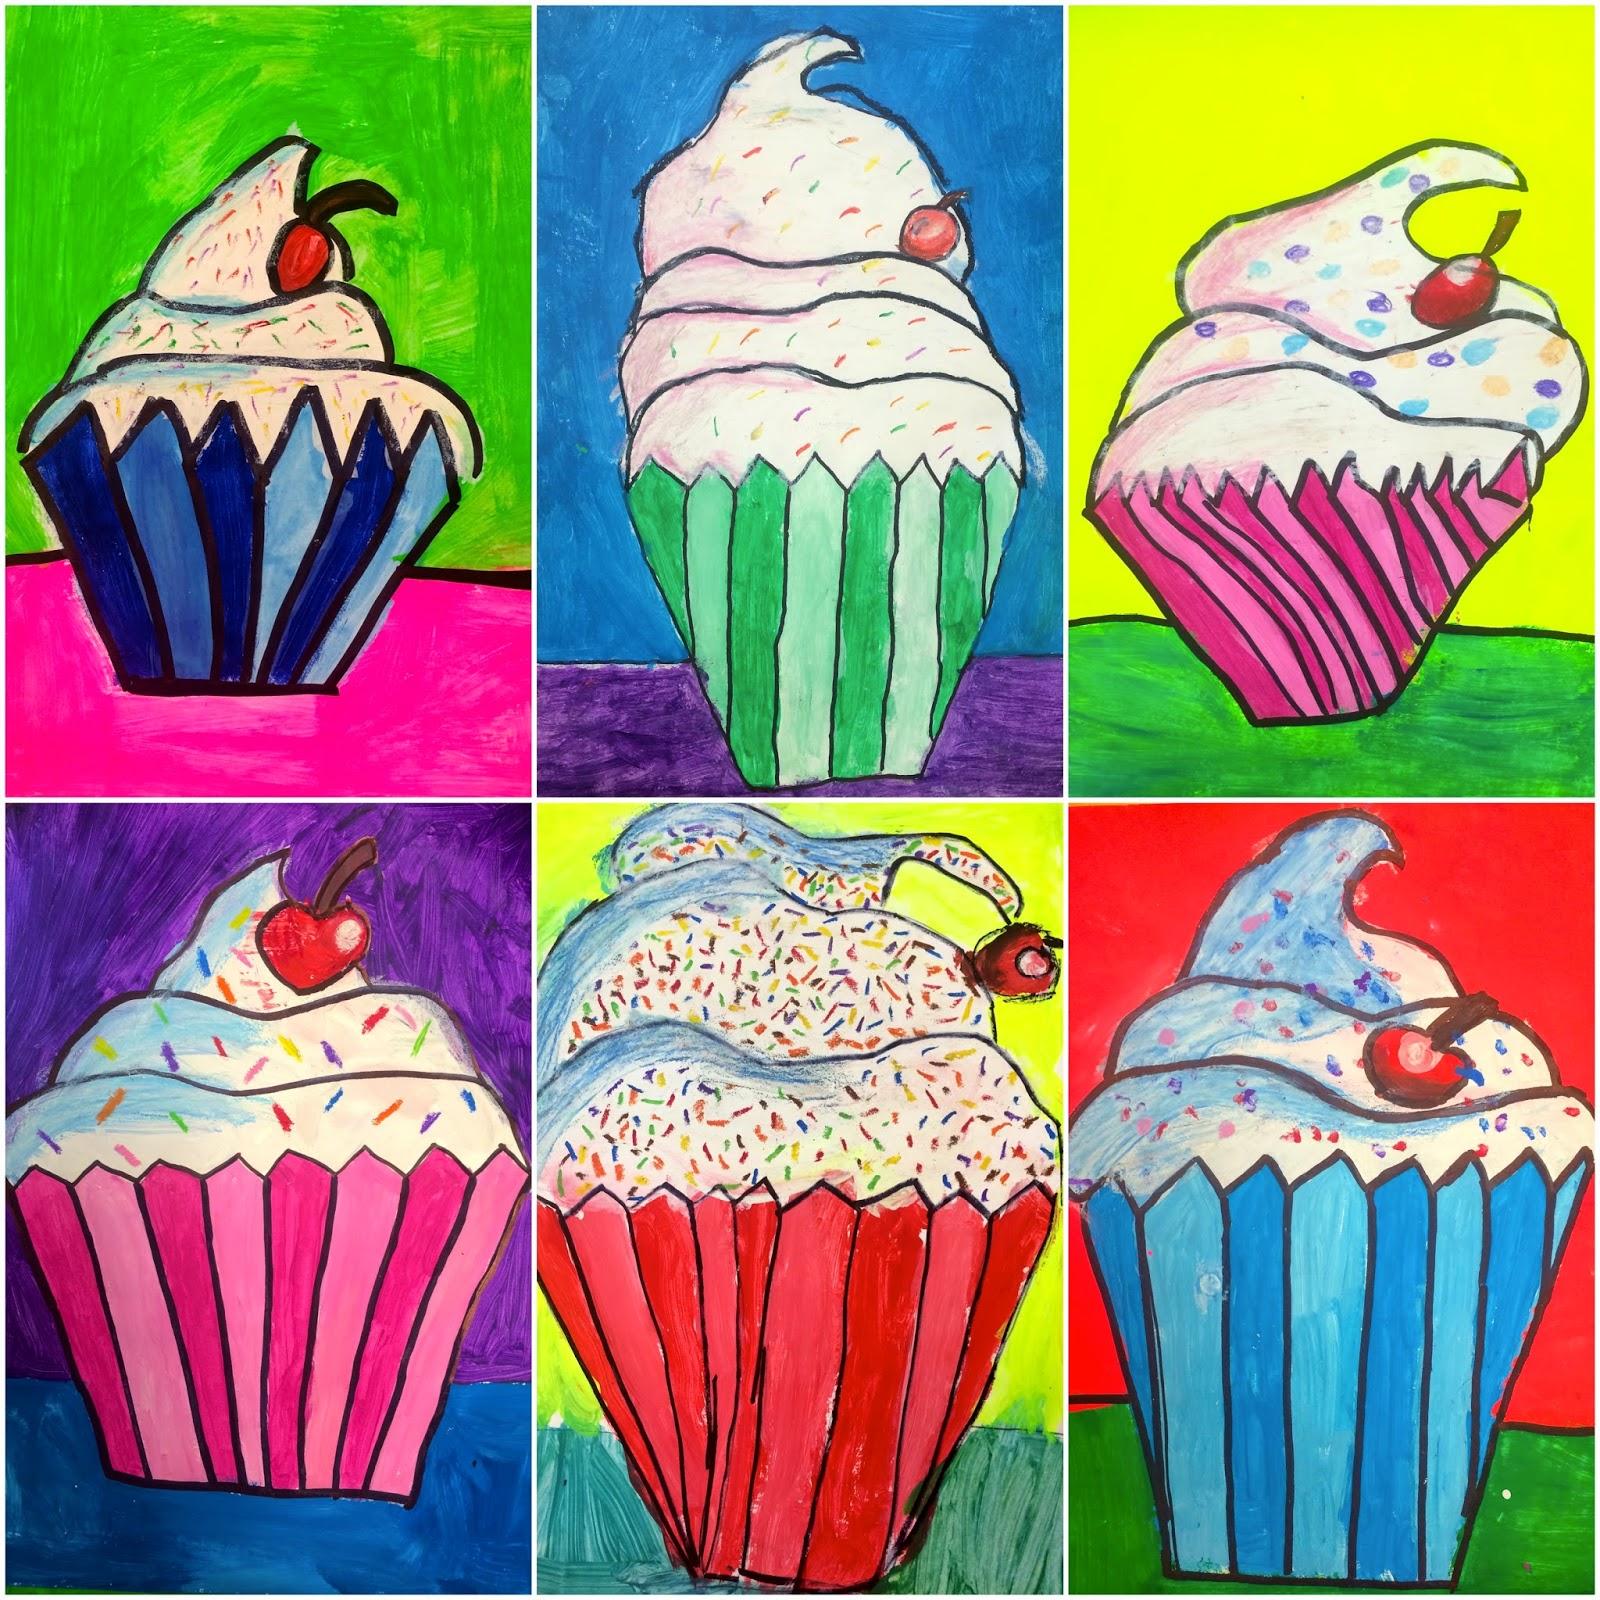 Cake Art School : Art. Eat. Tie Dye. Repeat.: 4th Grade Wayne Thiebaud Cupcakes